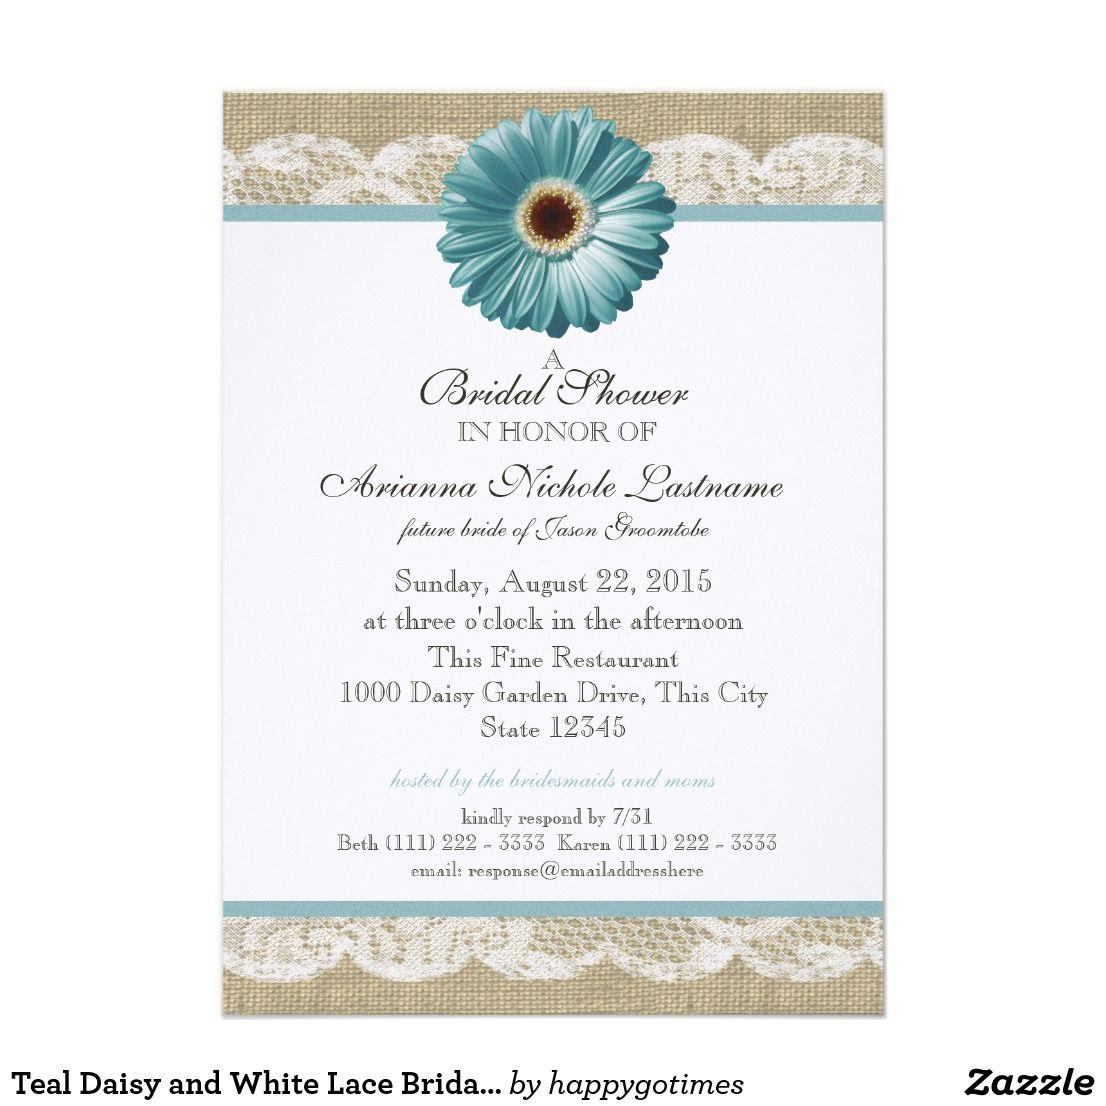 White Daisy Wedding Invitation: Teal Daisy And White Lace Bridal Shower Invitation